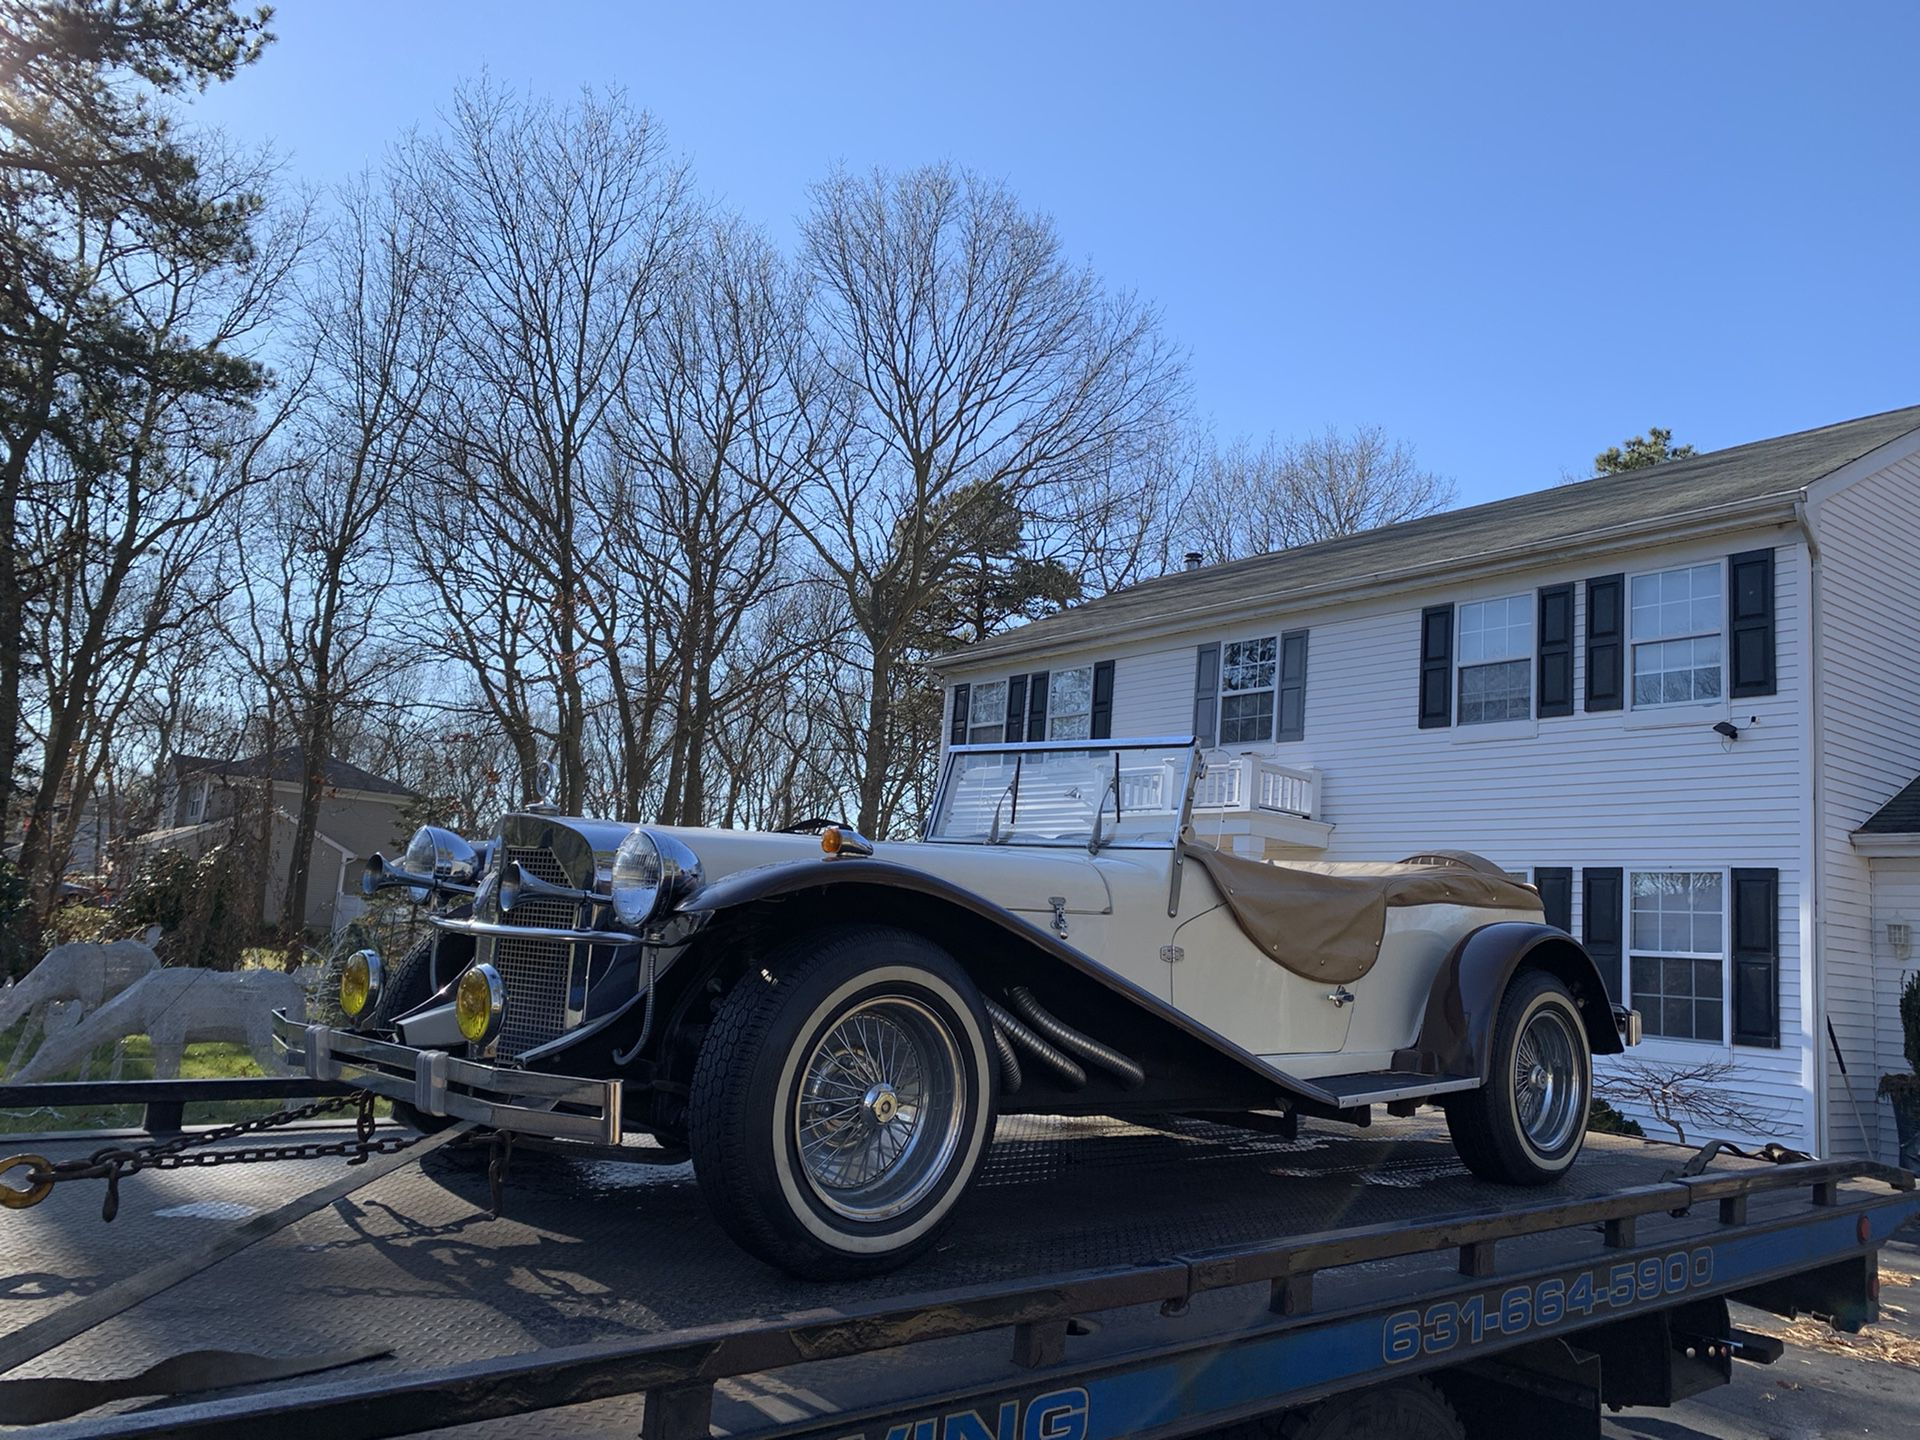 Mercedes Benz -SSK Deluxe- Gazelle 1929 kit-car